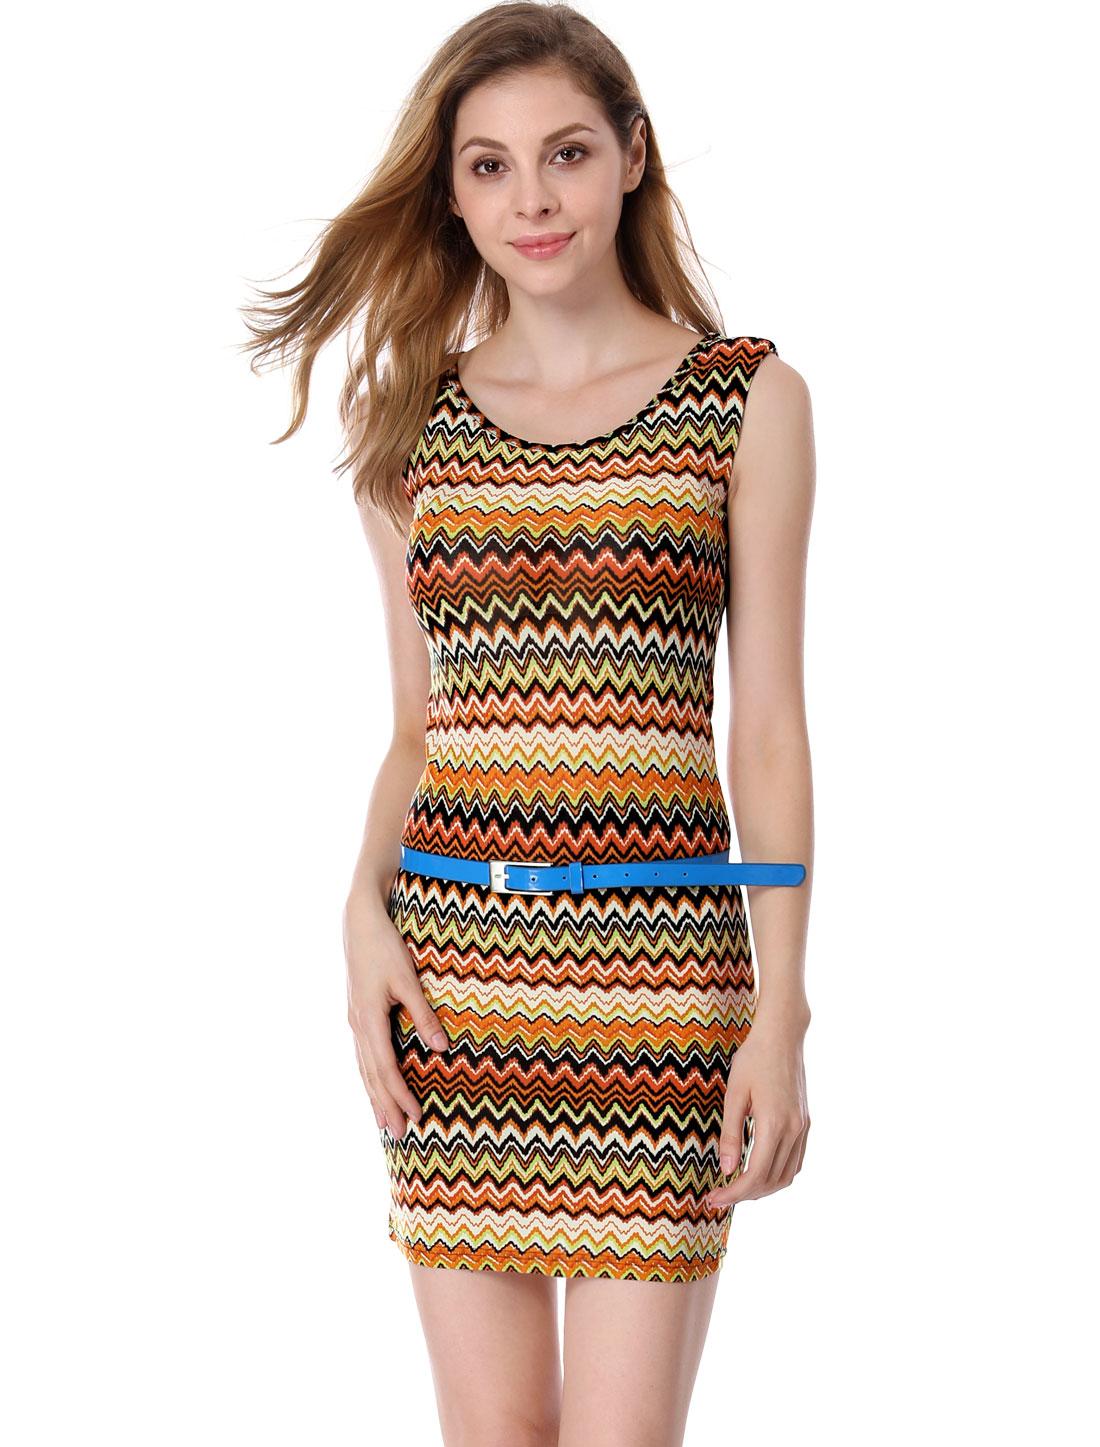 Woman Orange Light Yellow Padded Shoulder Slim Fit Mini Dress L